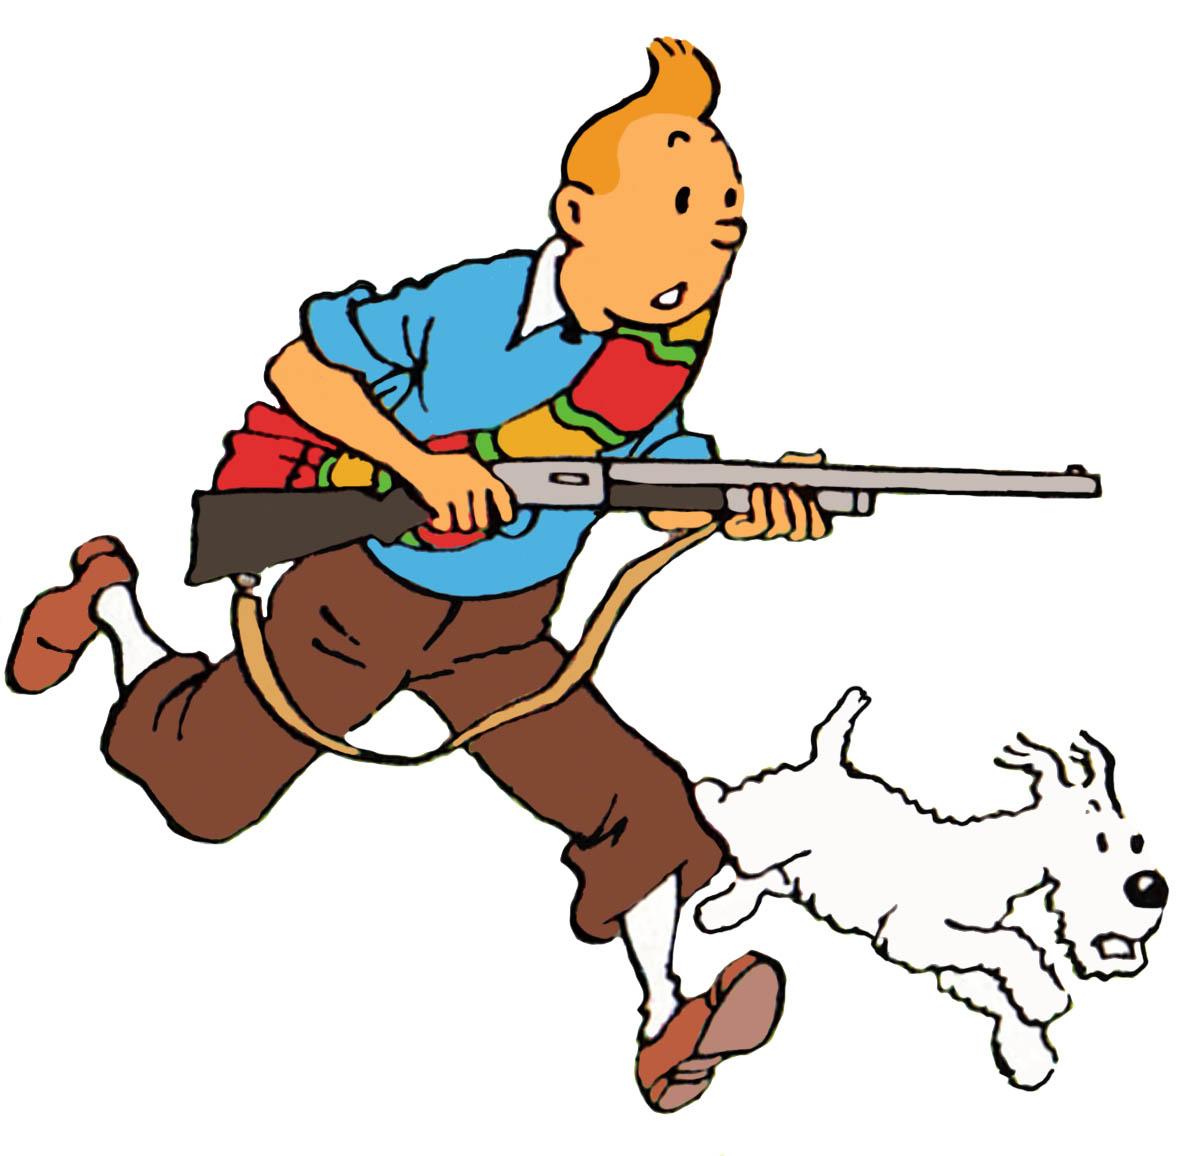 Image tintin with a rifle g wiki fandom